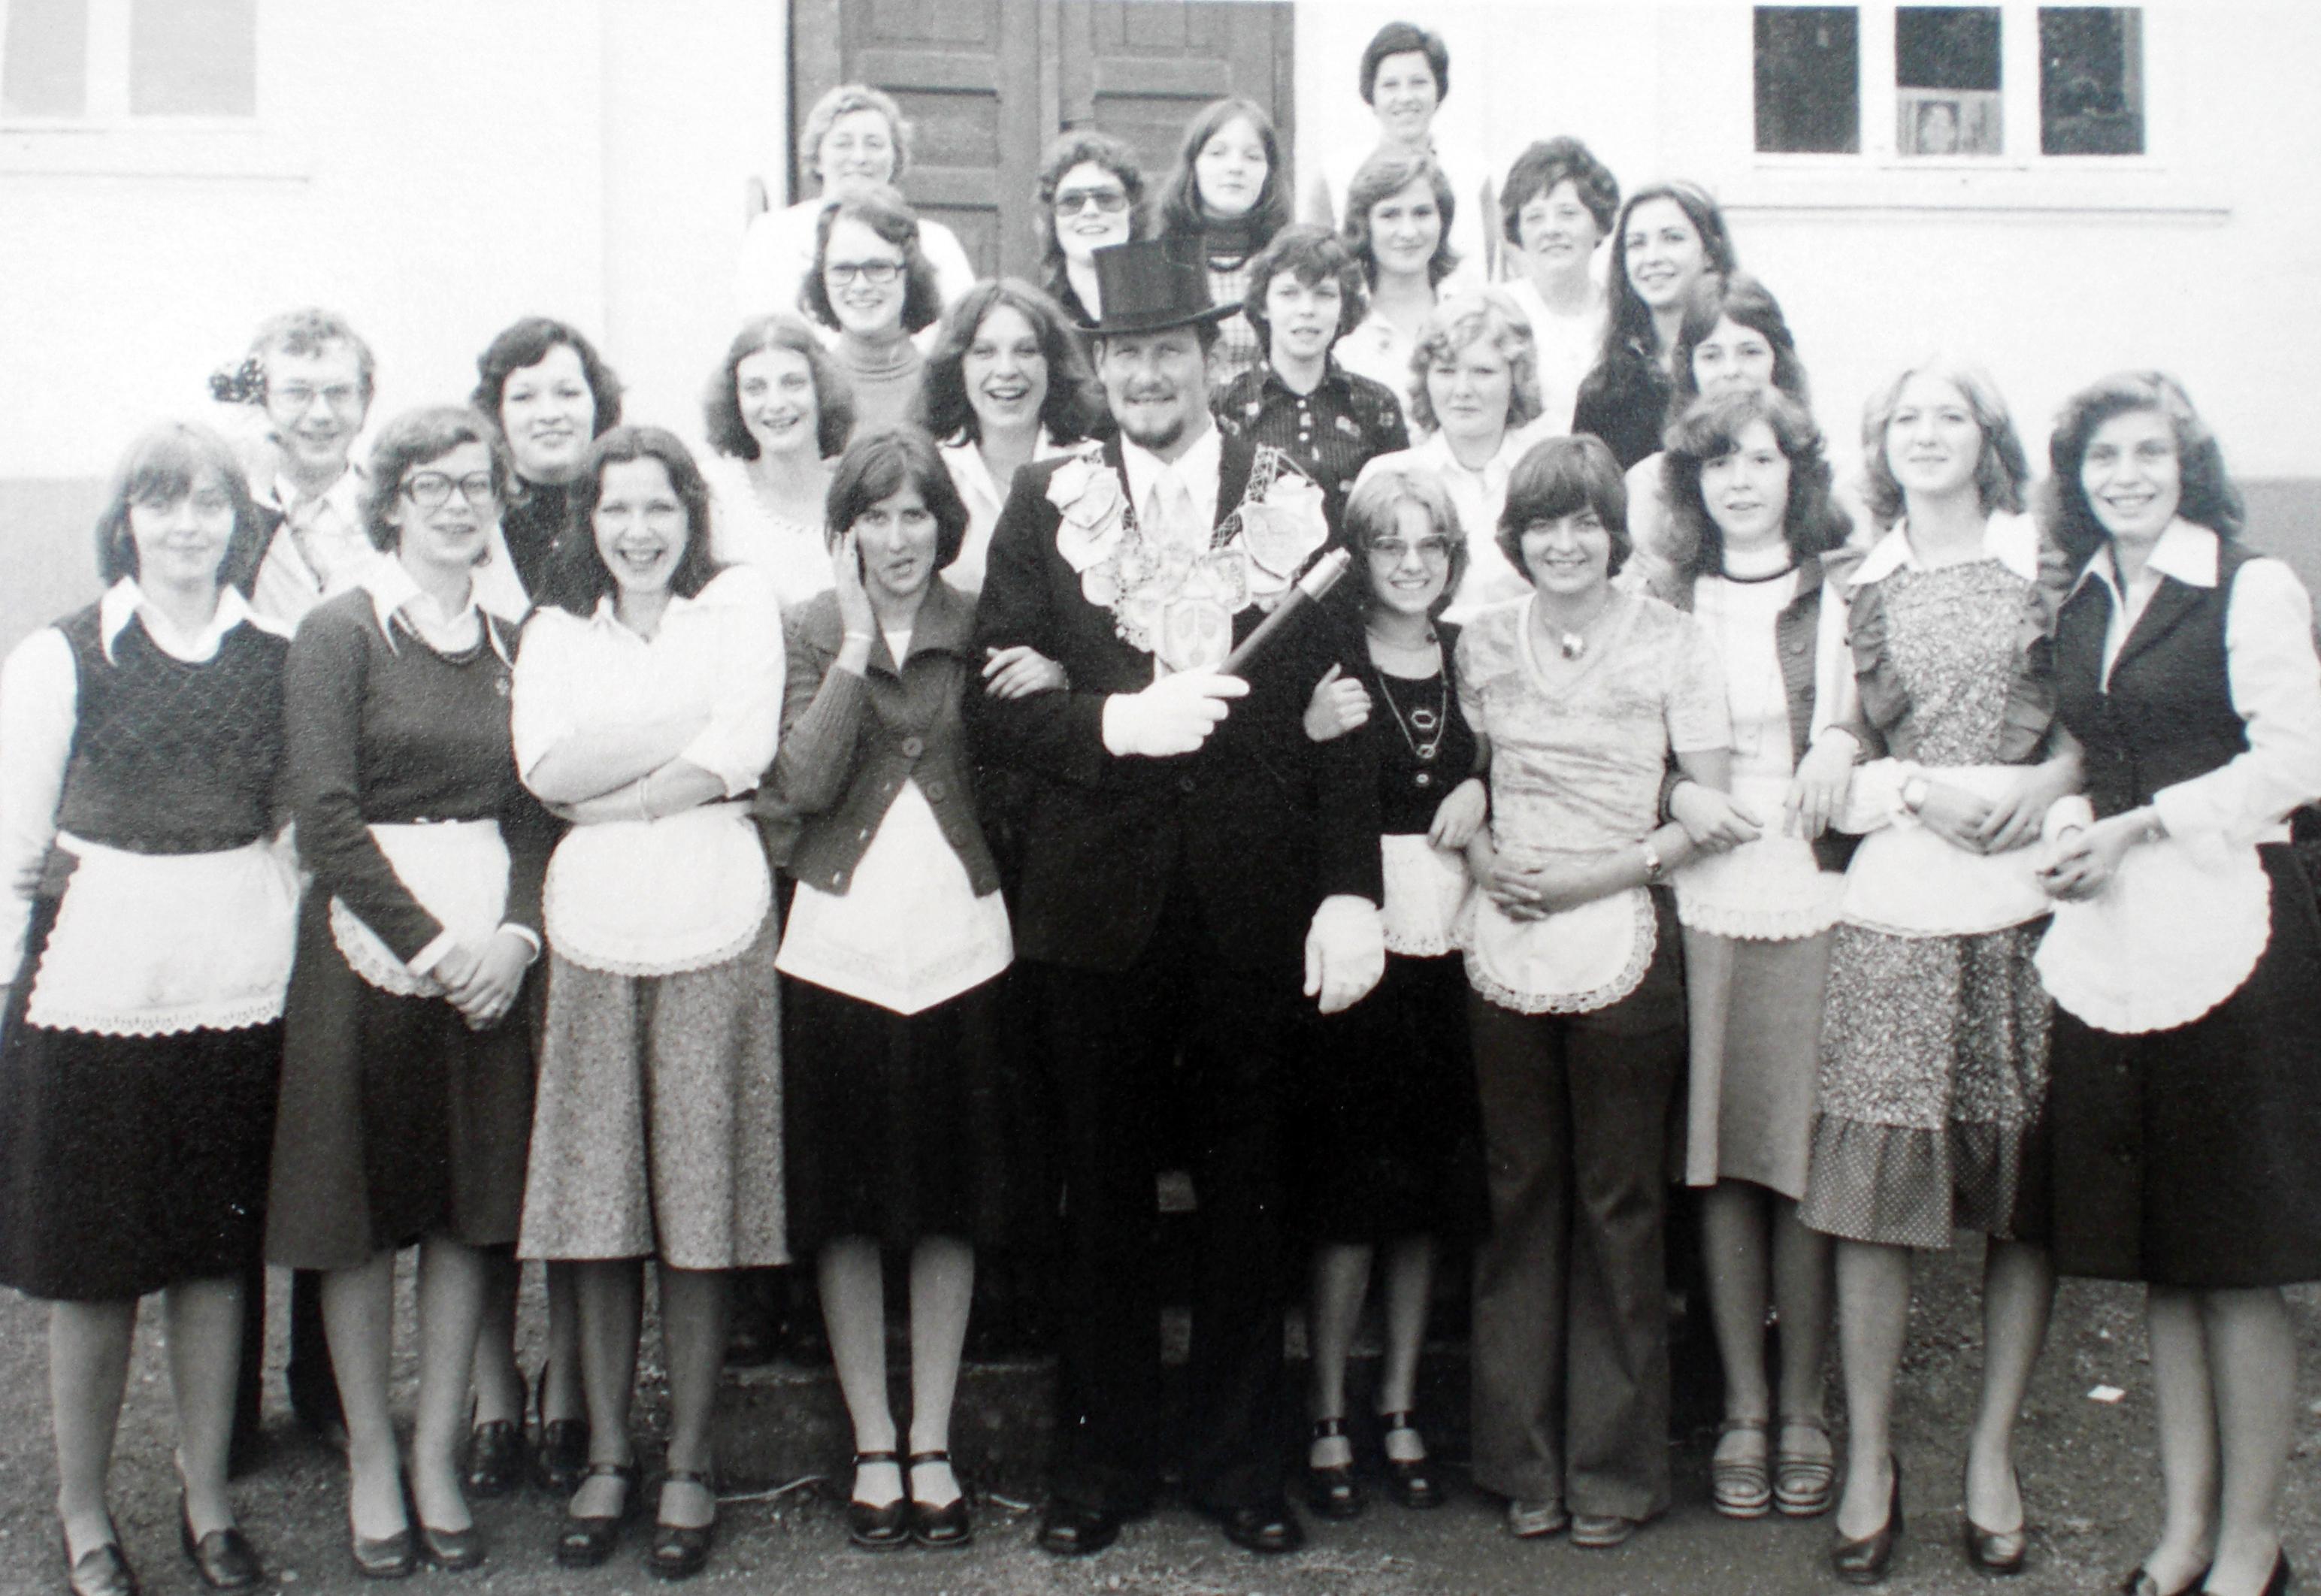 Brötchesmädchen 1975: König:Reinhard Schütz Foto:Doris Efferz